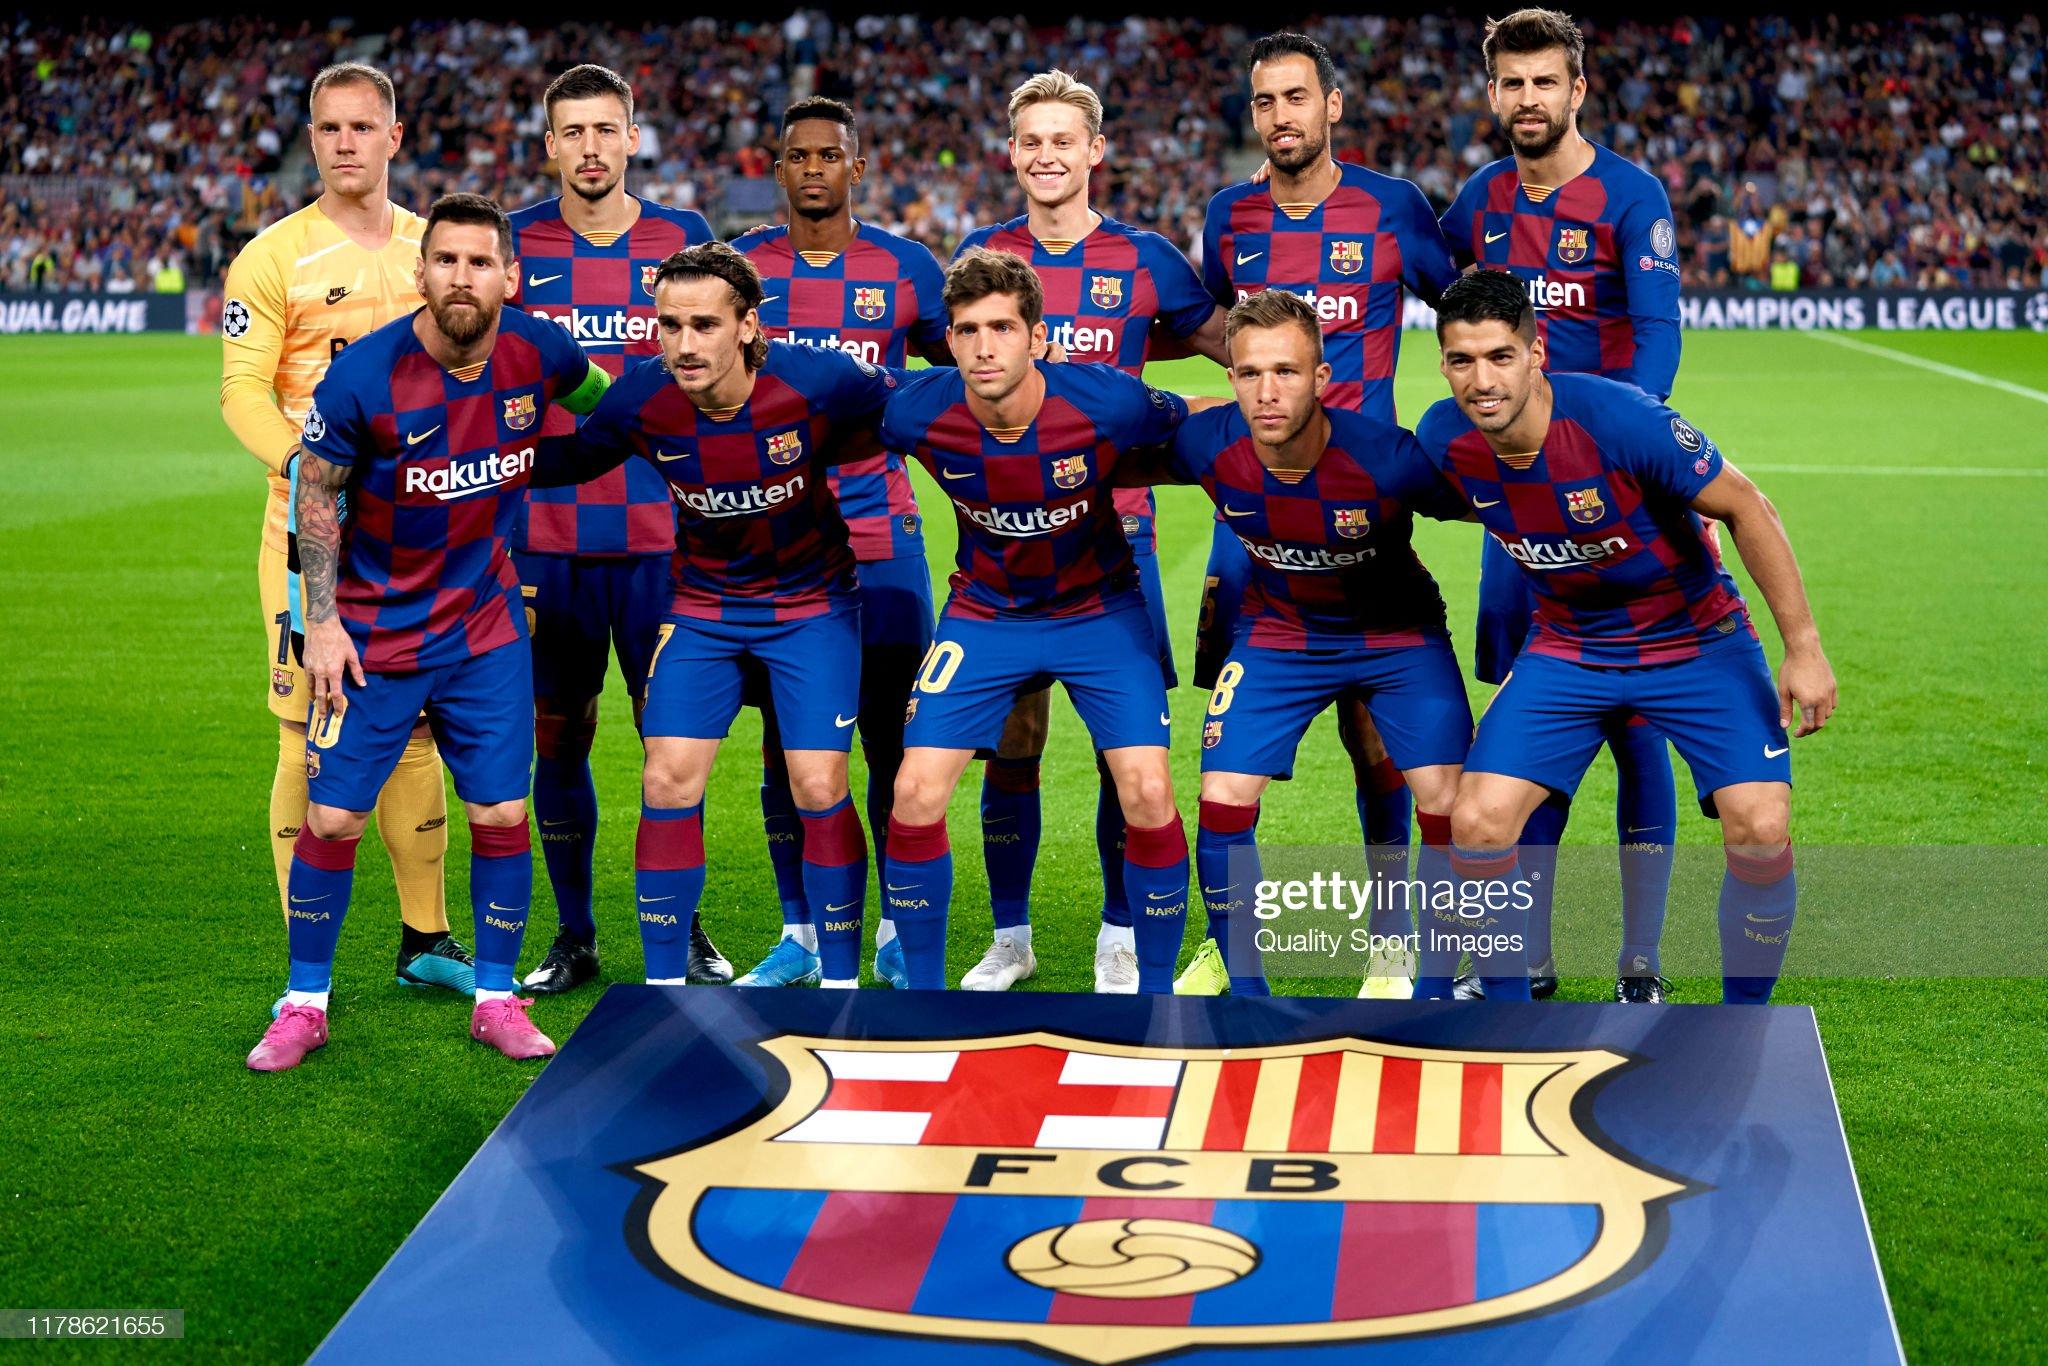 صور مباراة : برشلونة - إنتر 2-1 ( 02-10-2019 )  Players-of-fc-barcelona-pose-for-the-team-photo-prior-to-the-uefa-picture-id1178621655?s=2048x2048